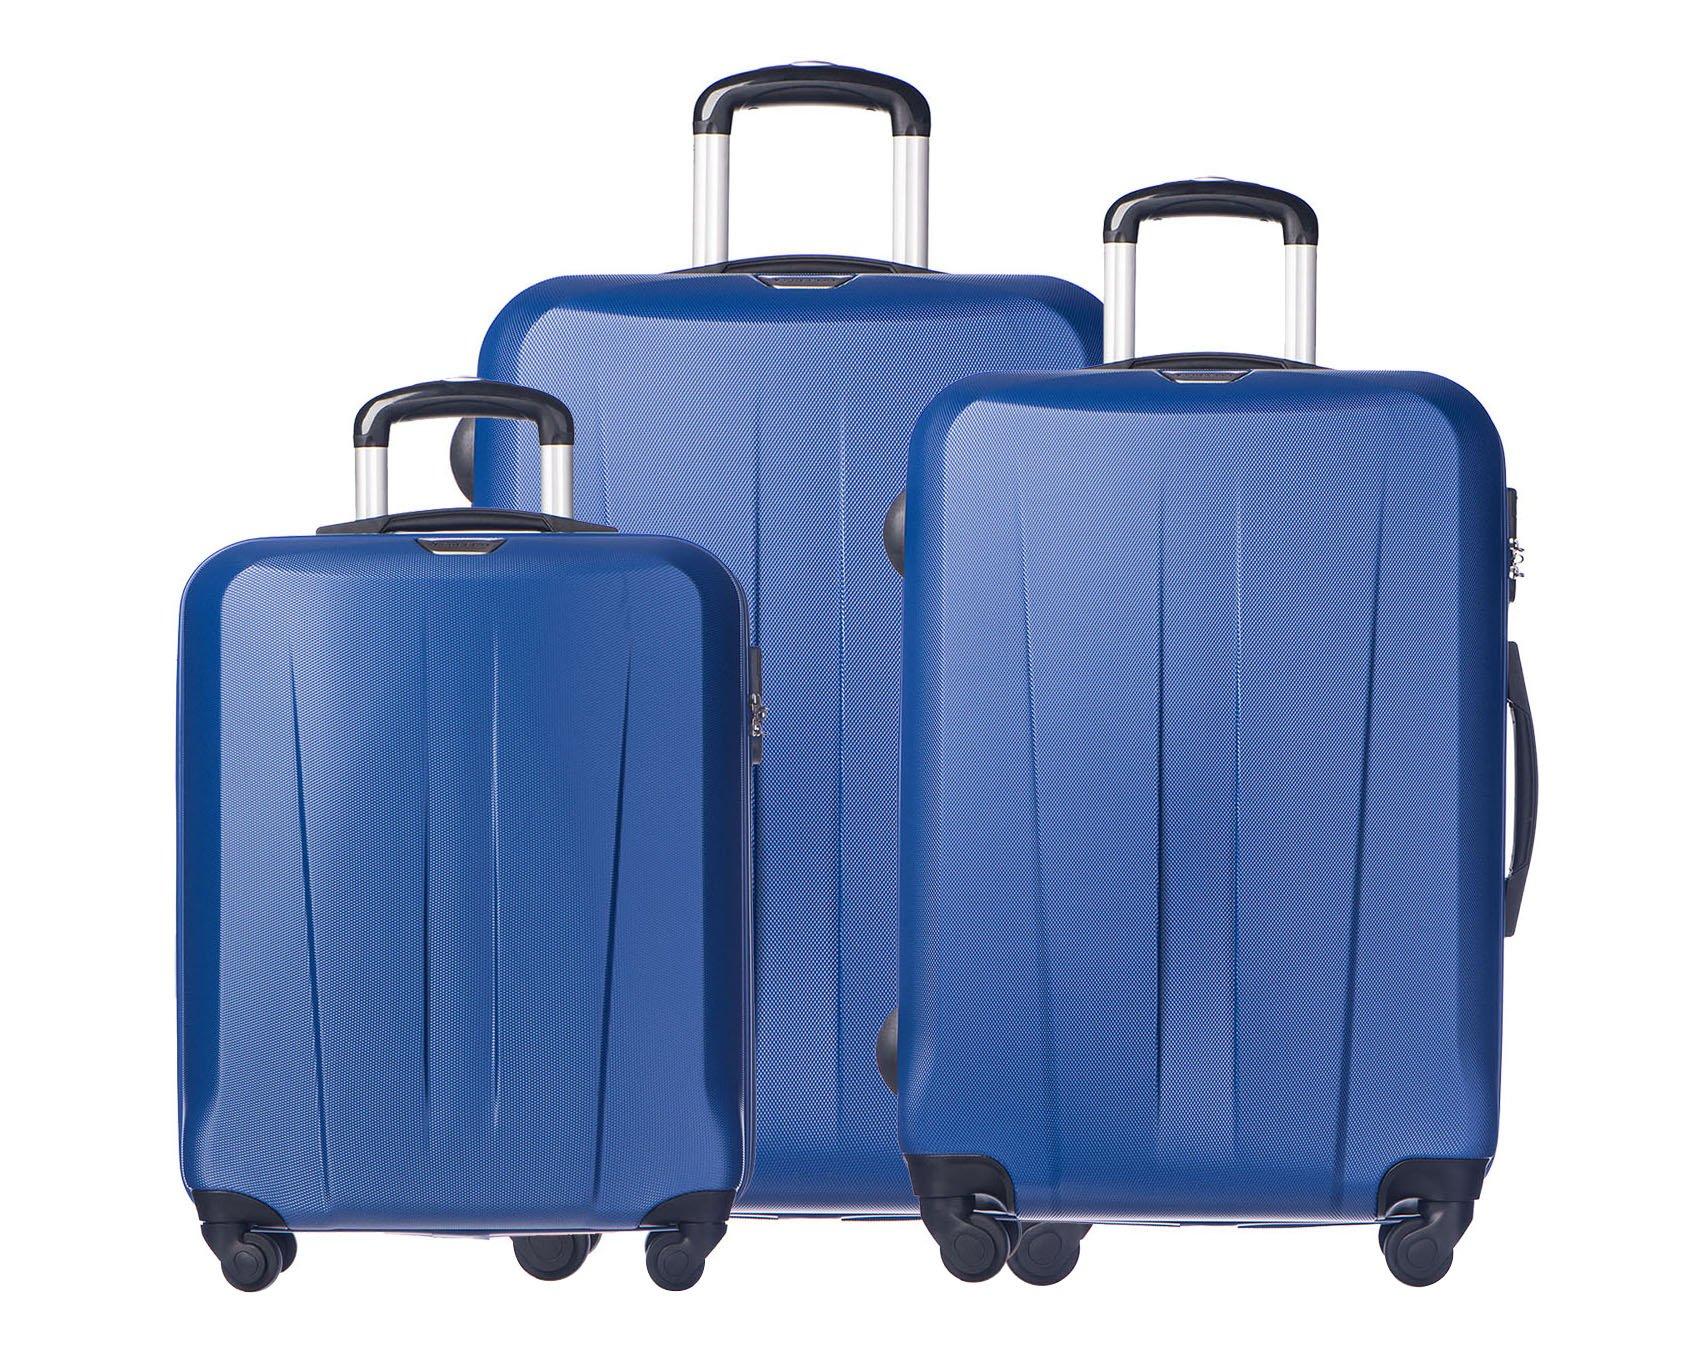 651a4c6fb4dbe OUTLET Komplet walizek na kółkach Puccini Paris - 7276280540 ...